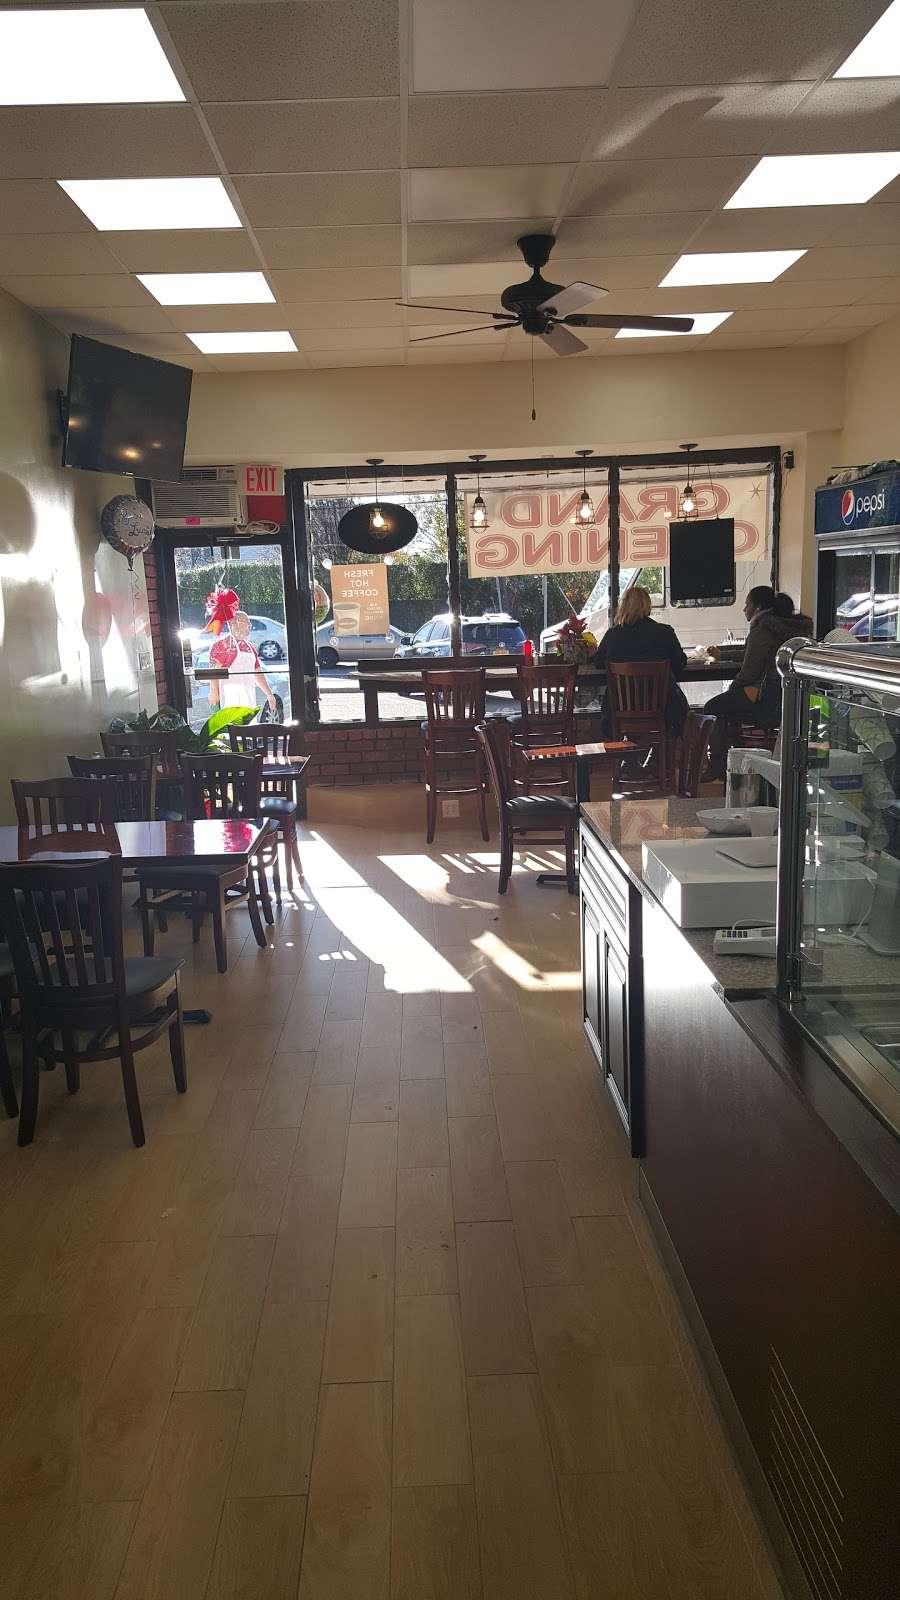 Gyro Spot - restaurant  | Photo 7 of 10 | Address: 16 Central Ct, Valley Stream, NY 11580, USA | Phone: (516) 612-9791